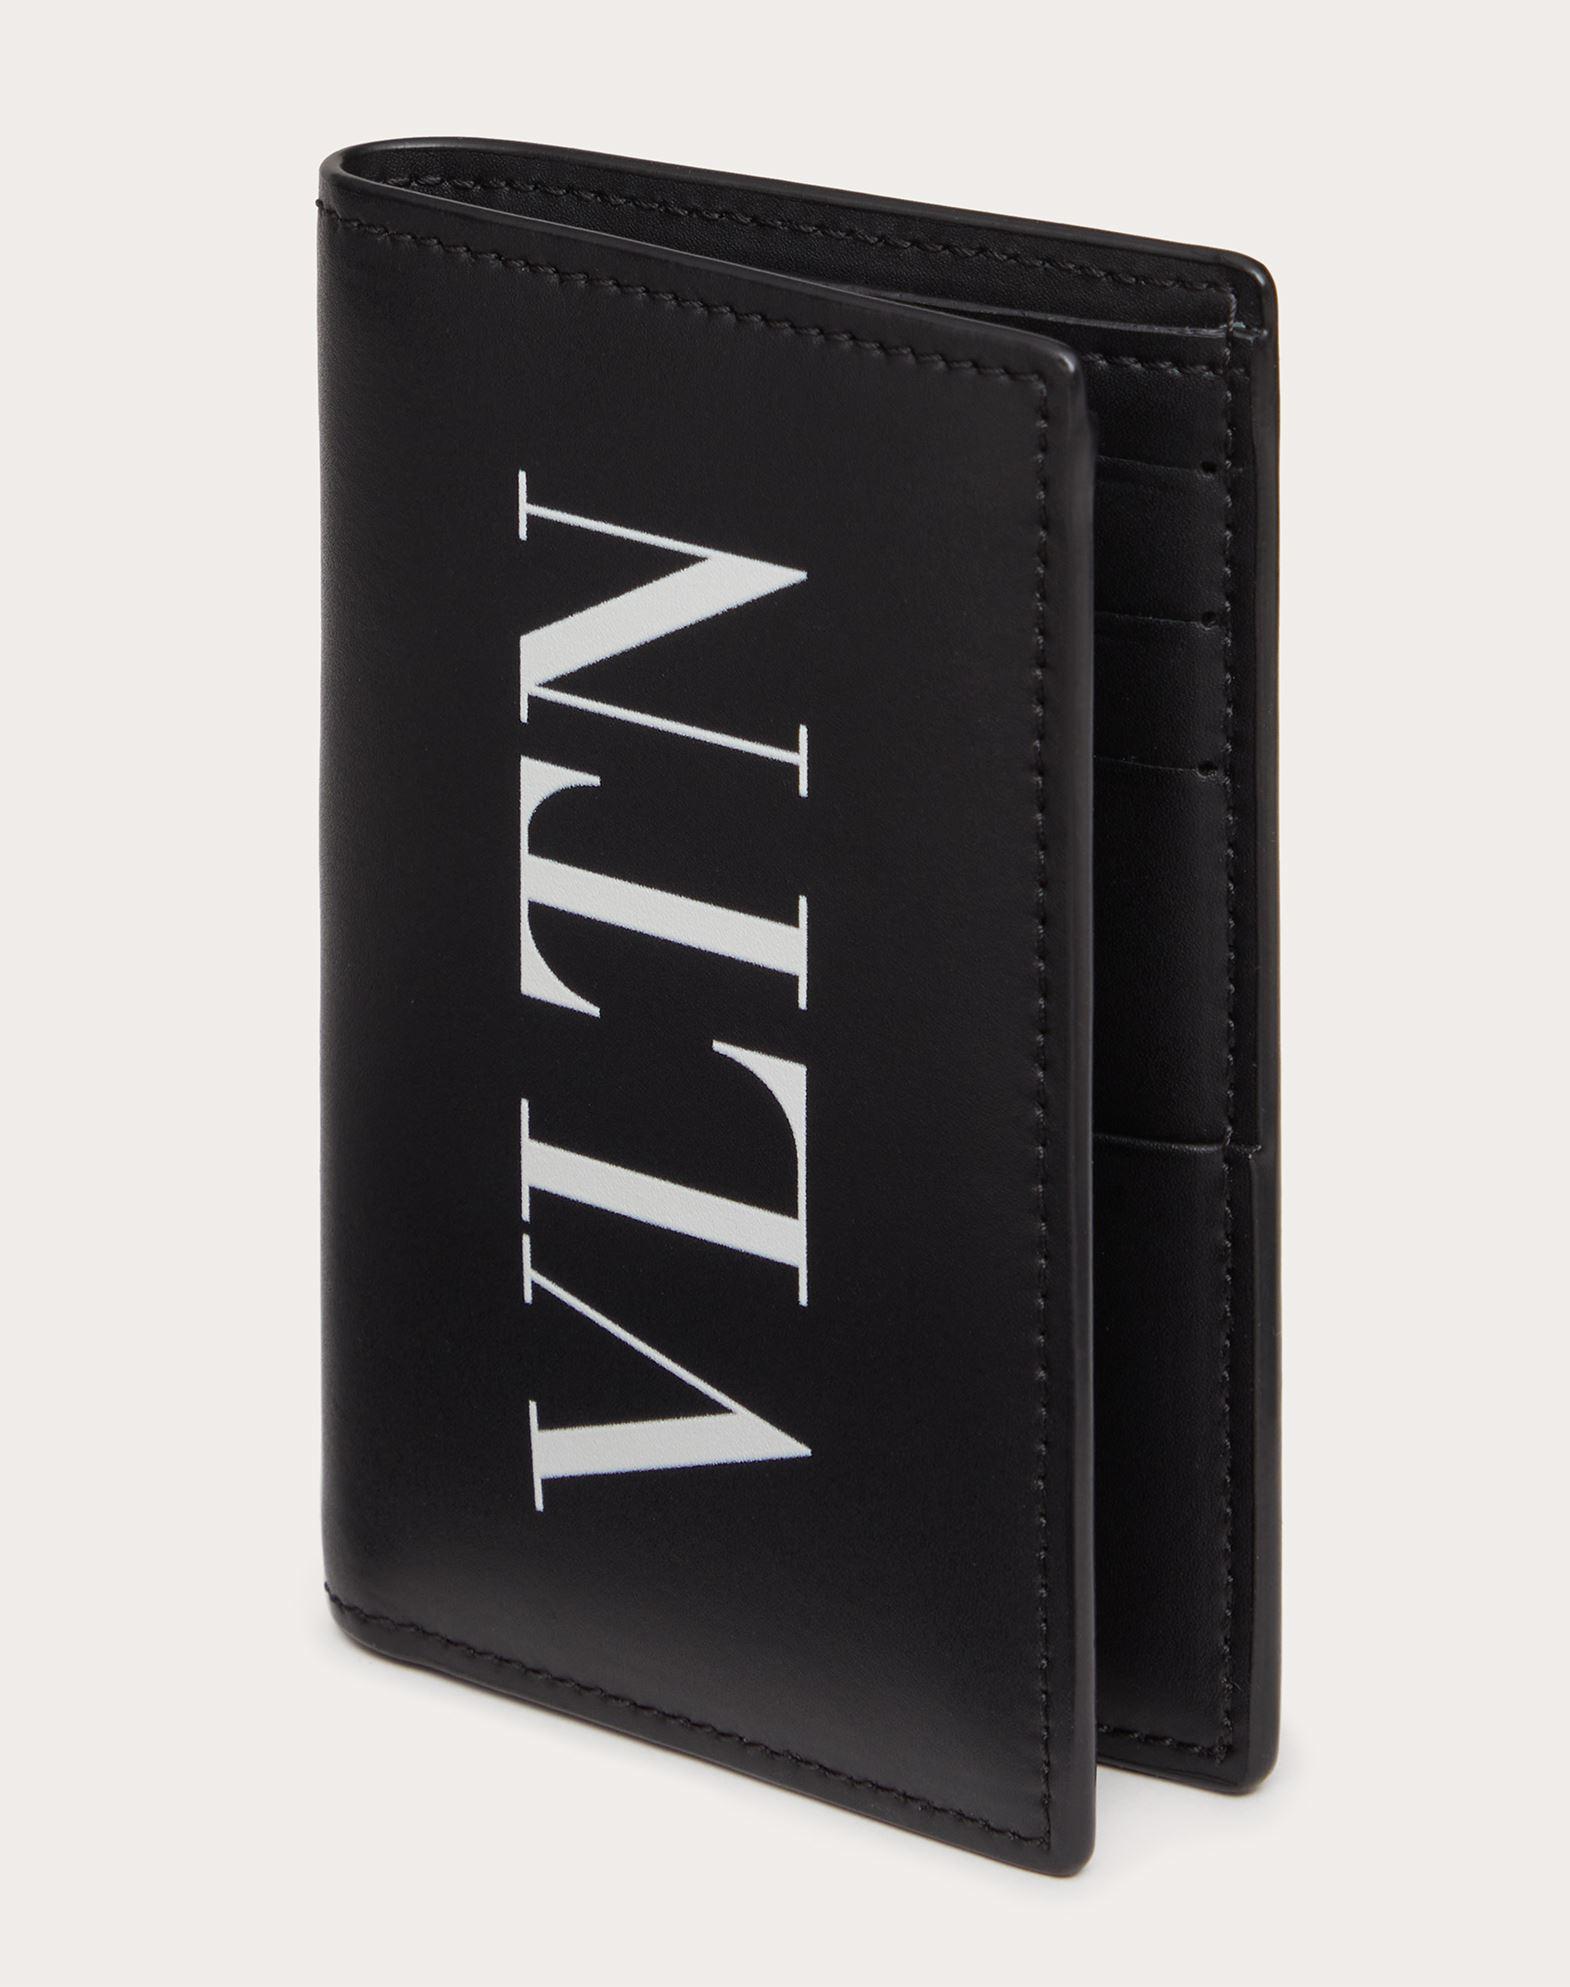 VALENTINO GARAVANI UOMO VLTN card holder COIN PURSES & CARD CASES U e